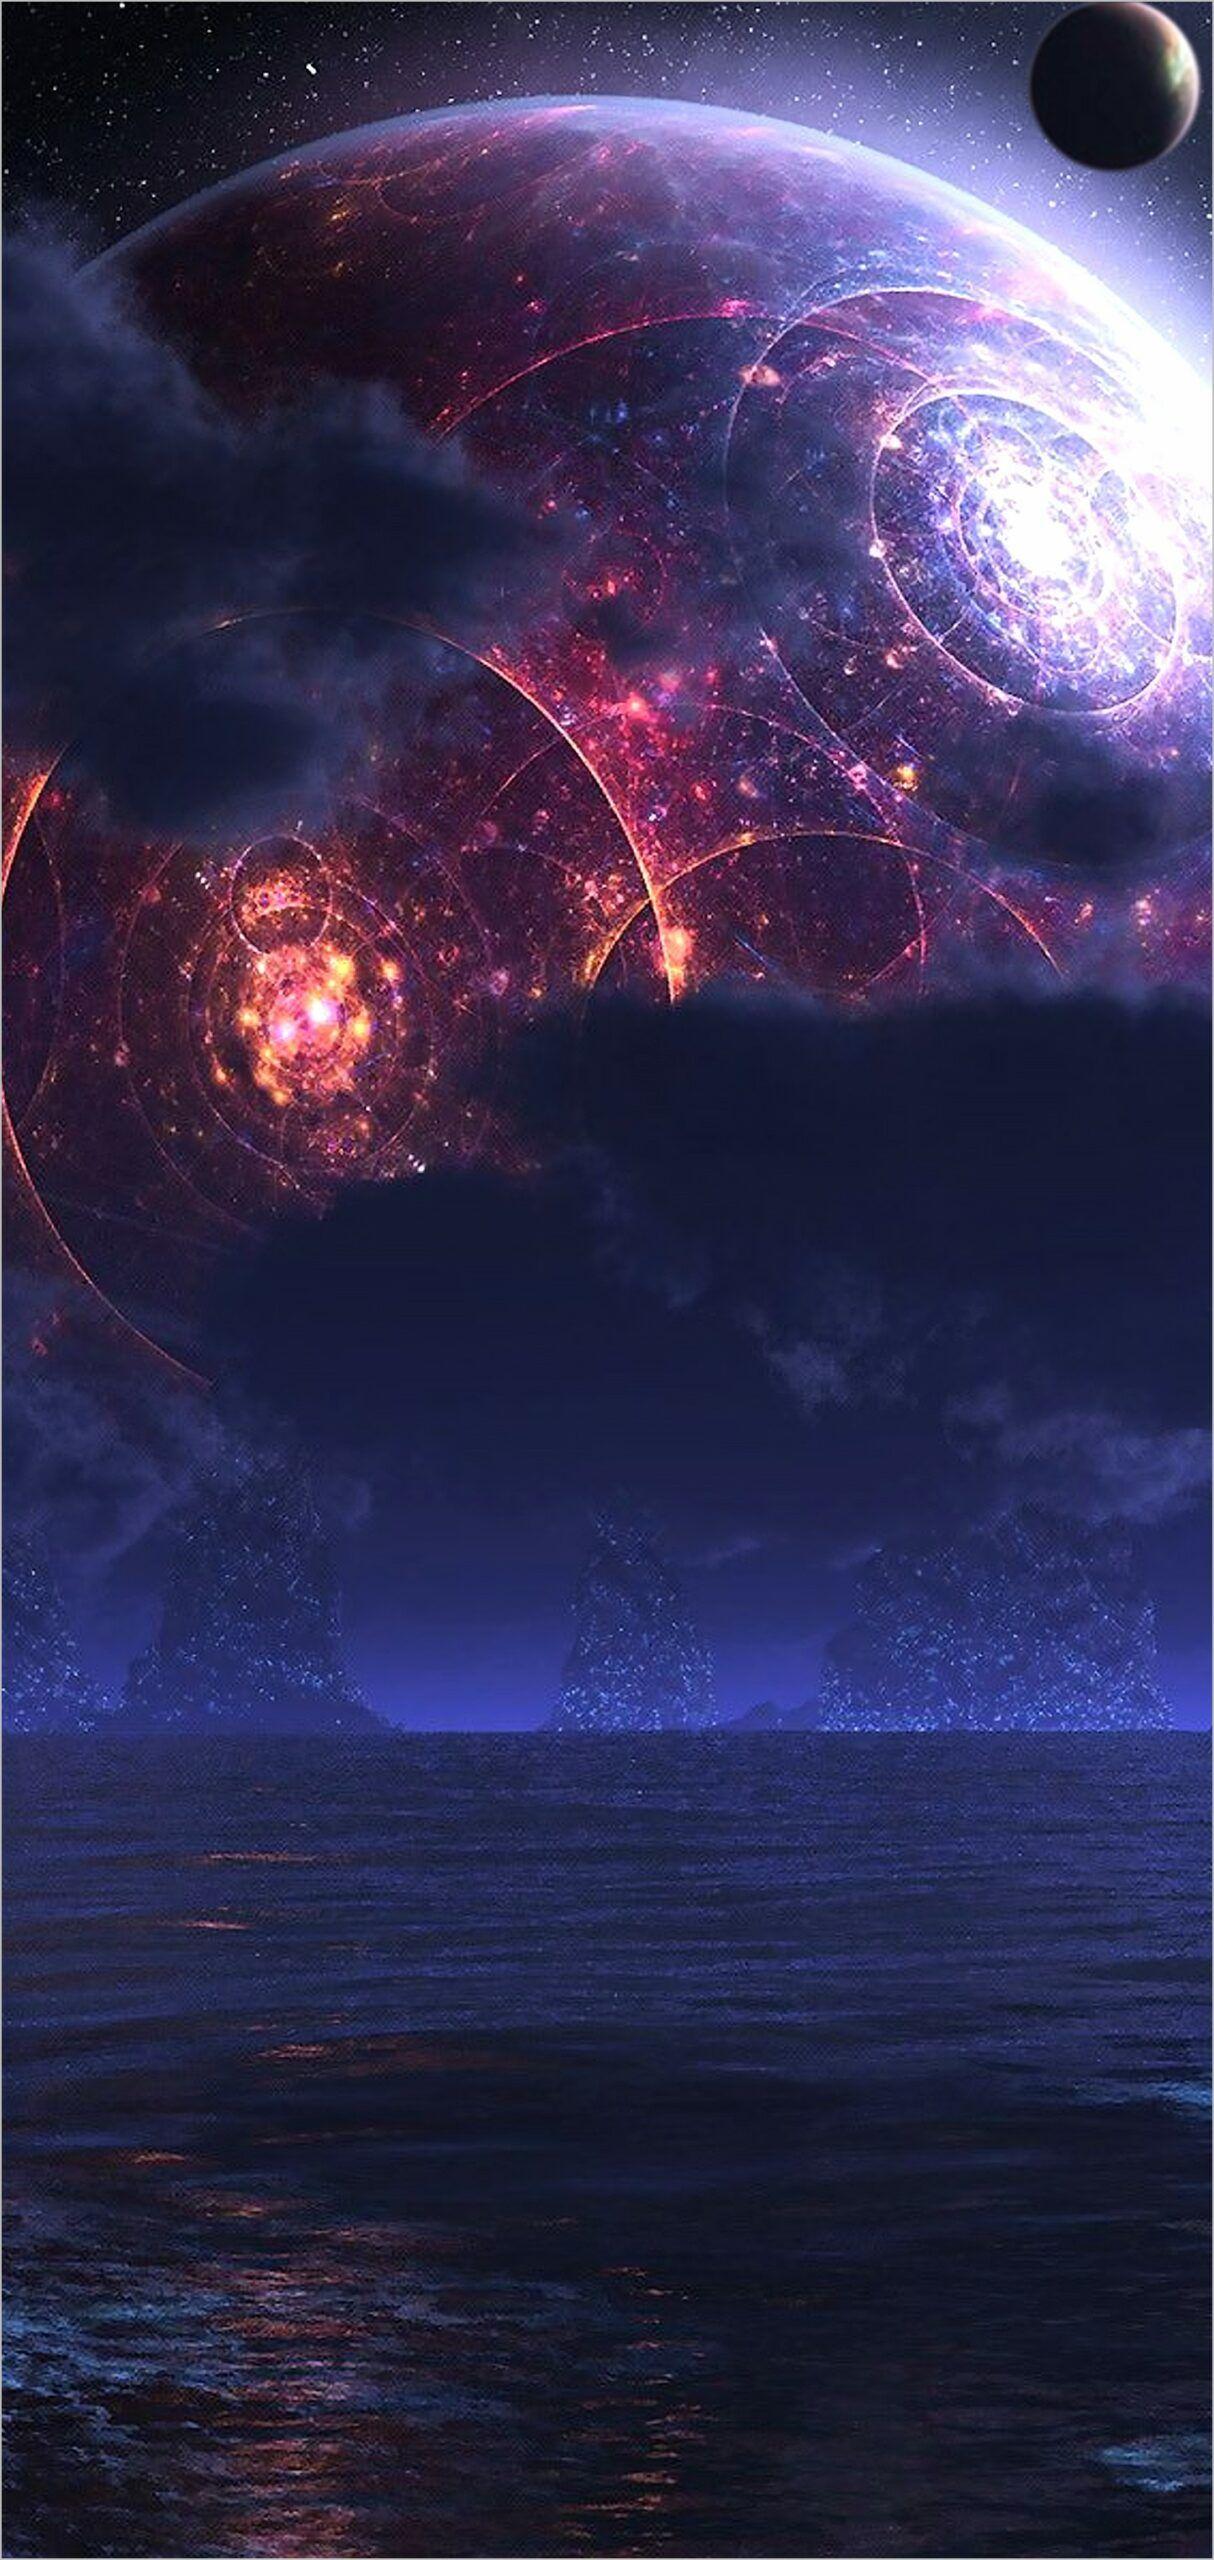 Cool Wallpapers 4k Galaxy S10 Galaxy Wallpaper Cool Wallpapers 4k Planets Wallpaper